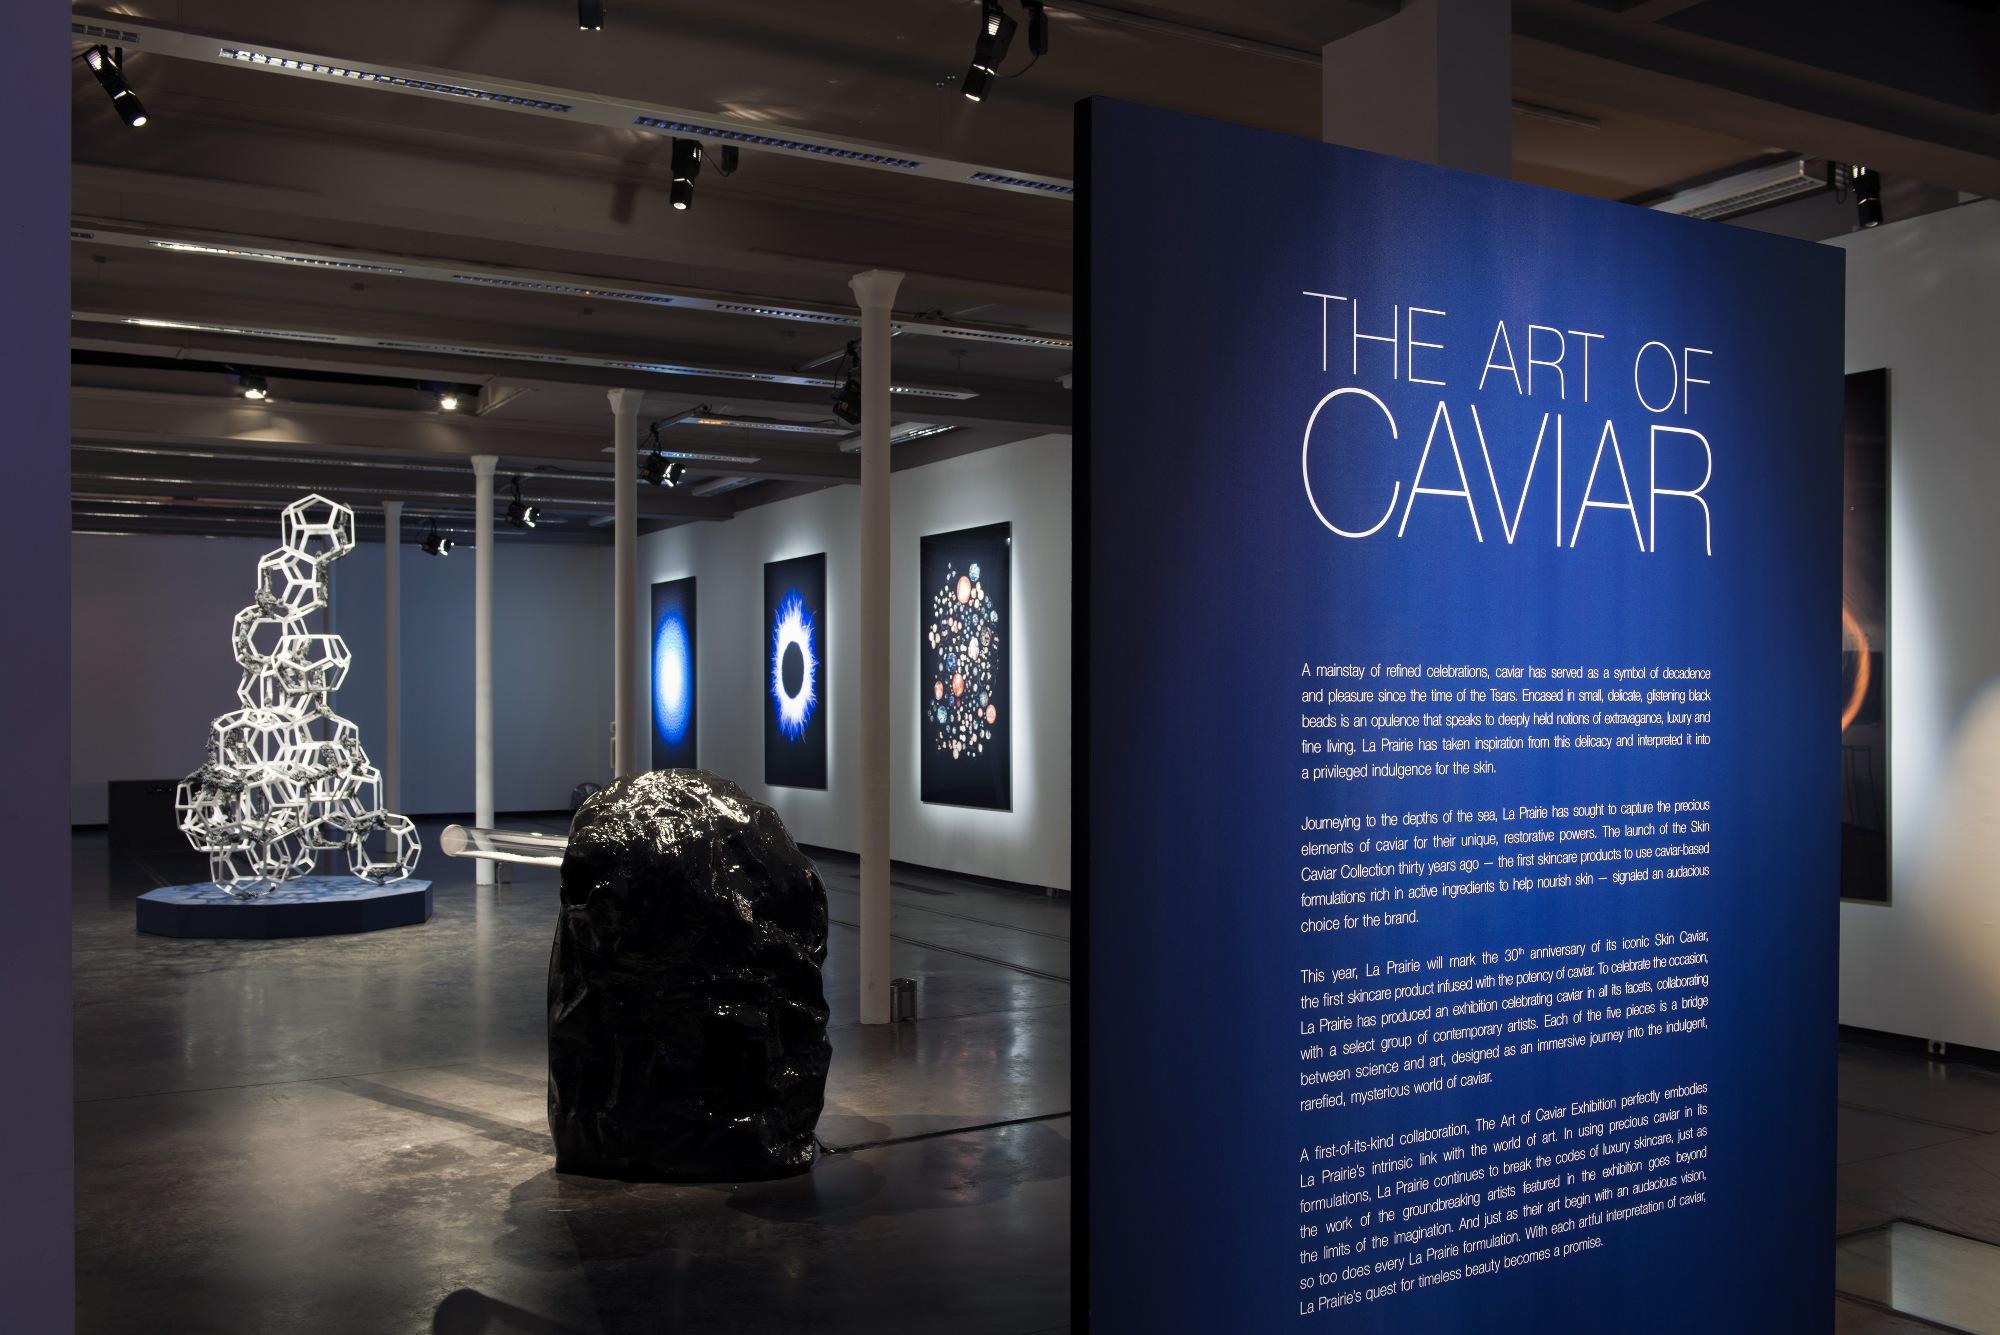 the art of caviar-exhibition-La Prairie